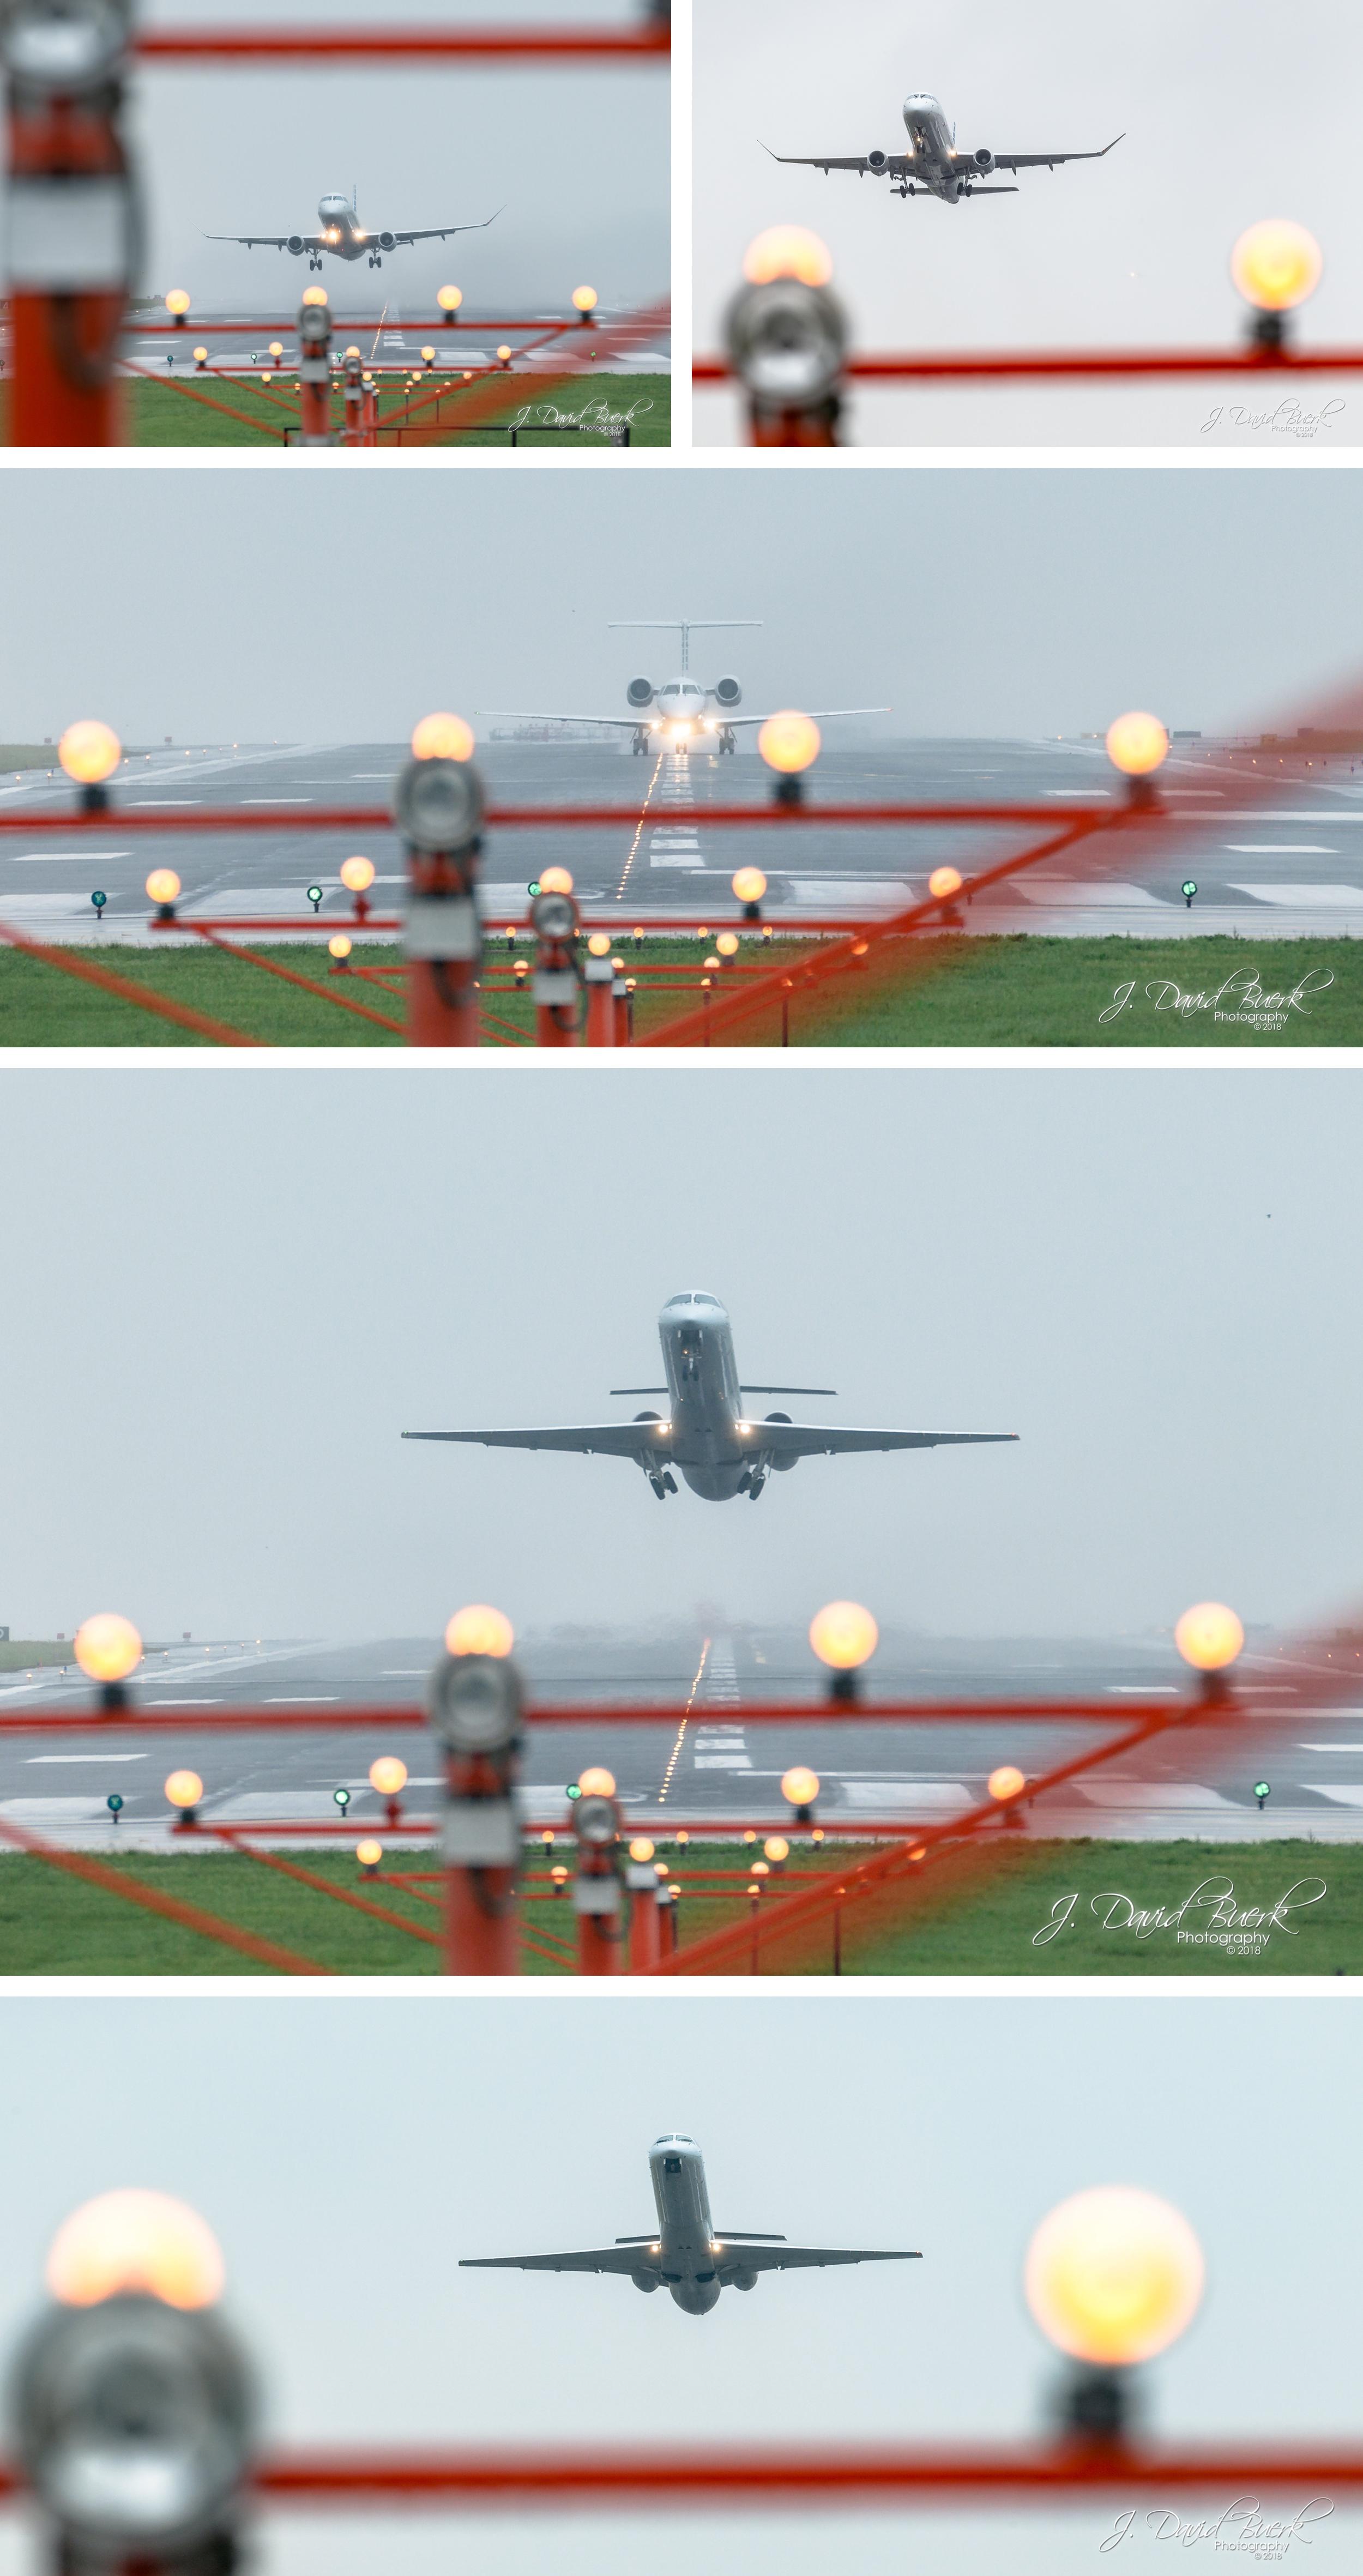 20180517 DCA Planespotting 3.jpg